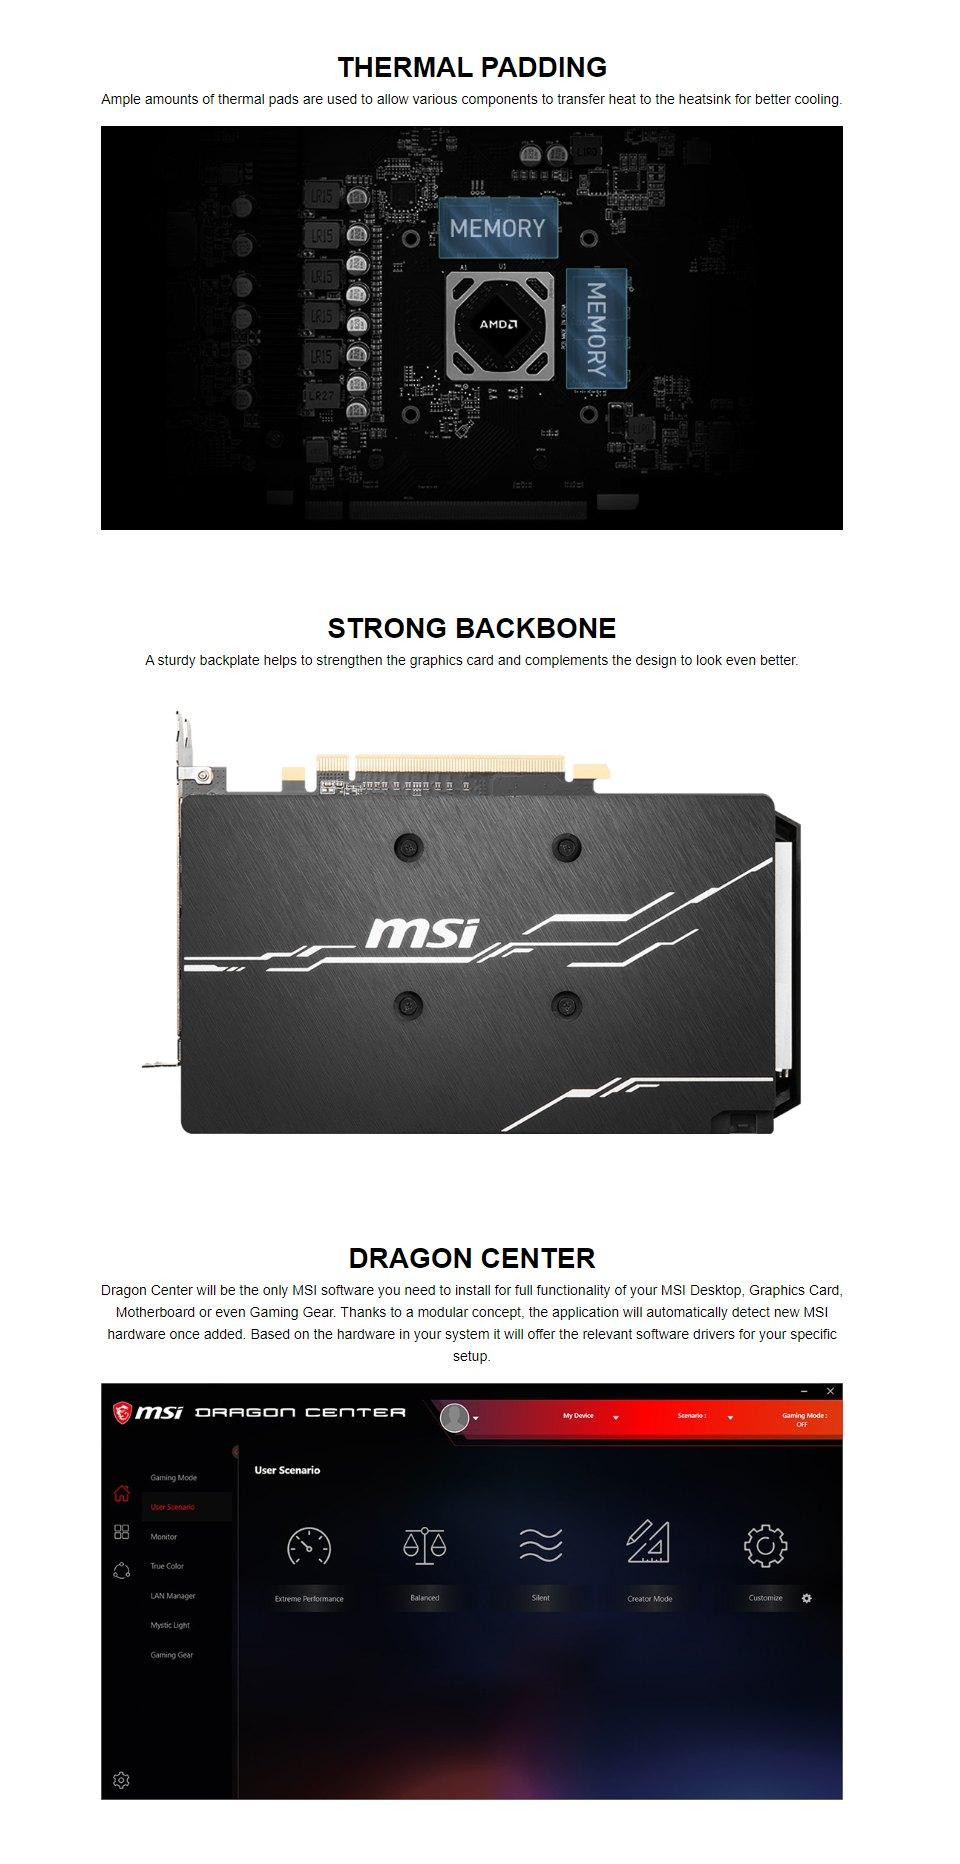 MSI Radeon RX 5500 XT Mech OC 8GB features 3